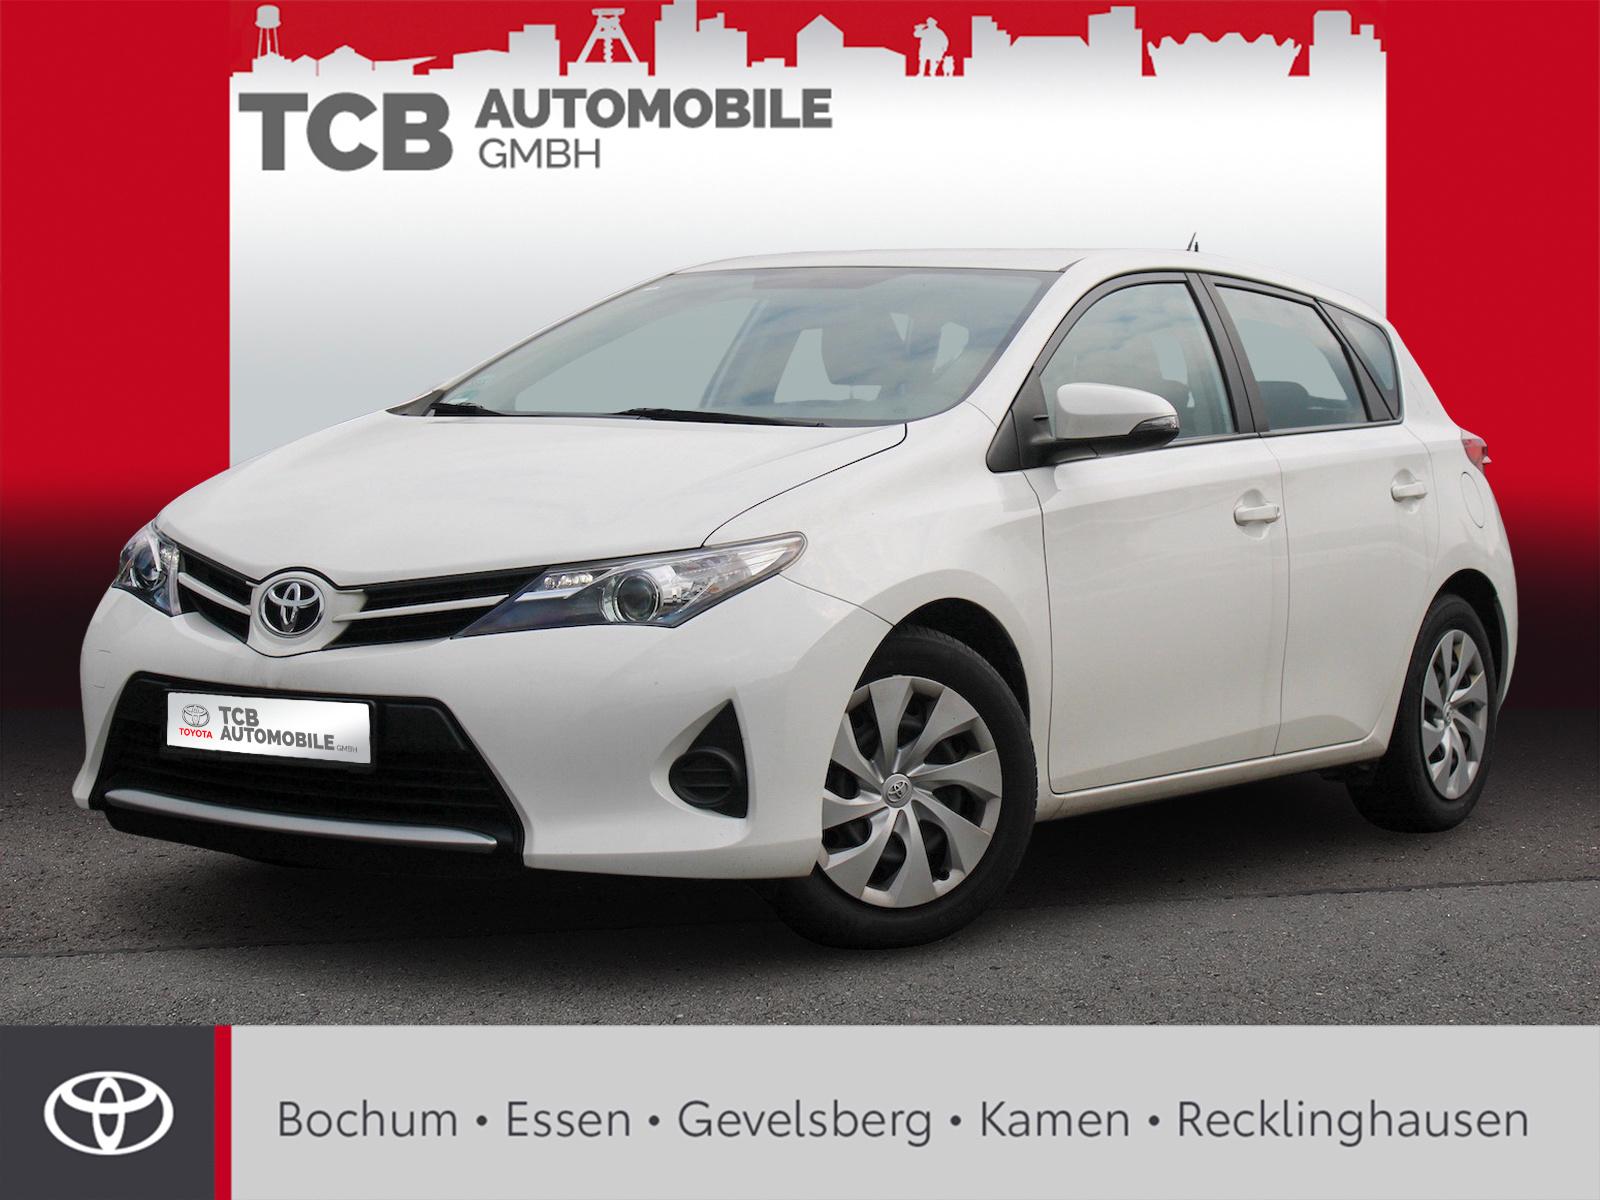 Toyota Auris COOL 1.33 KLIMAAUT. 8-FACH BEREIFT USB AUX, Jahr 2015, Benzin